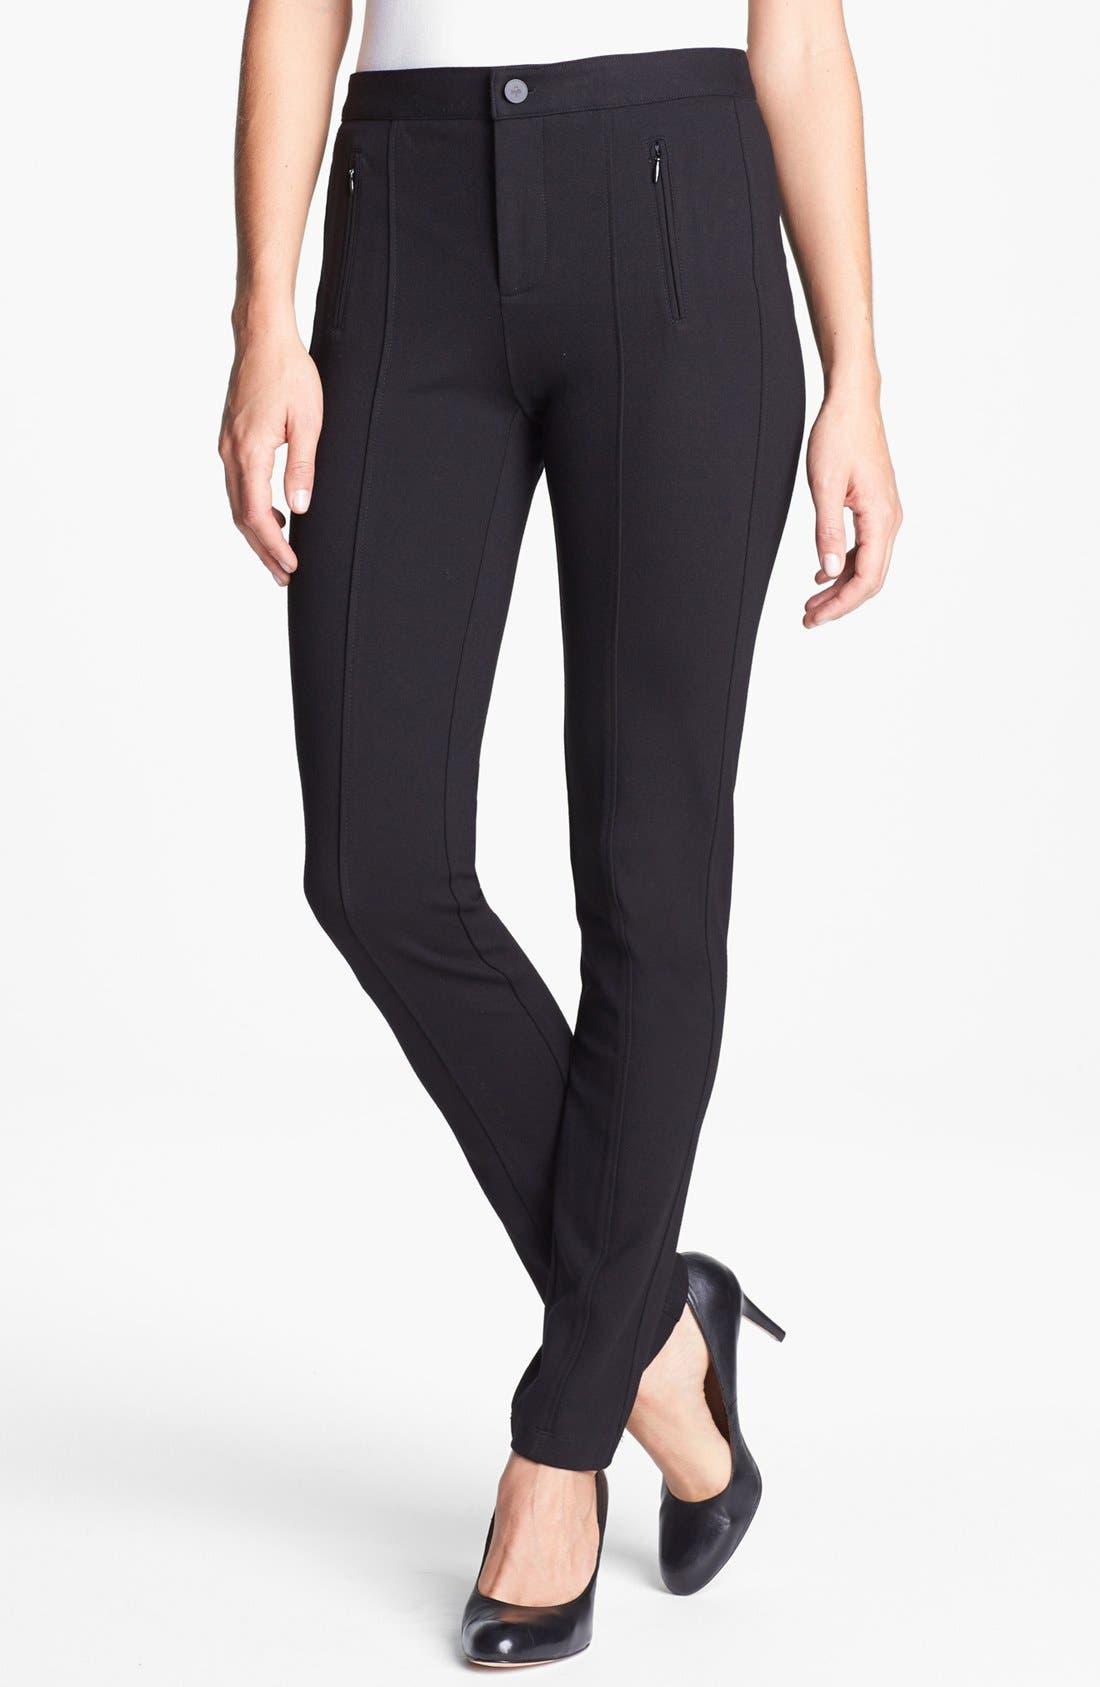 Alternate Image 1 Selected - NYDJ 'Ski' Zip Pocket Ponte Knit Pants (Petite)